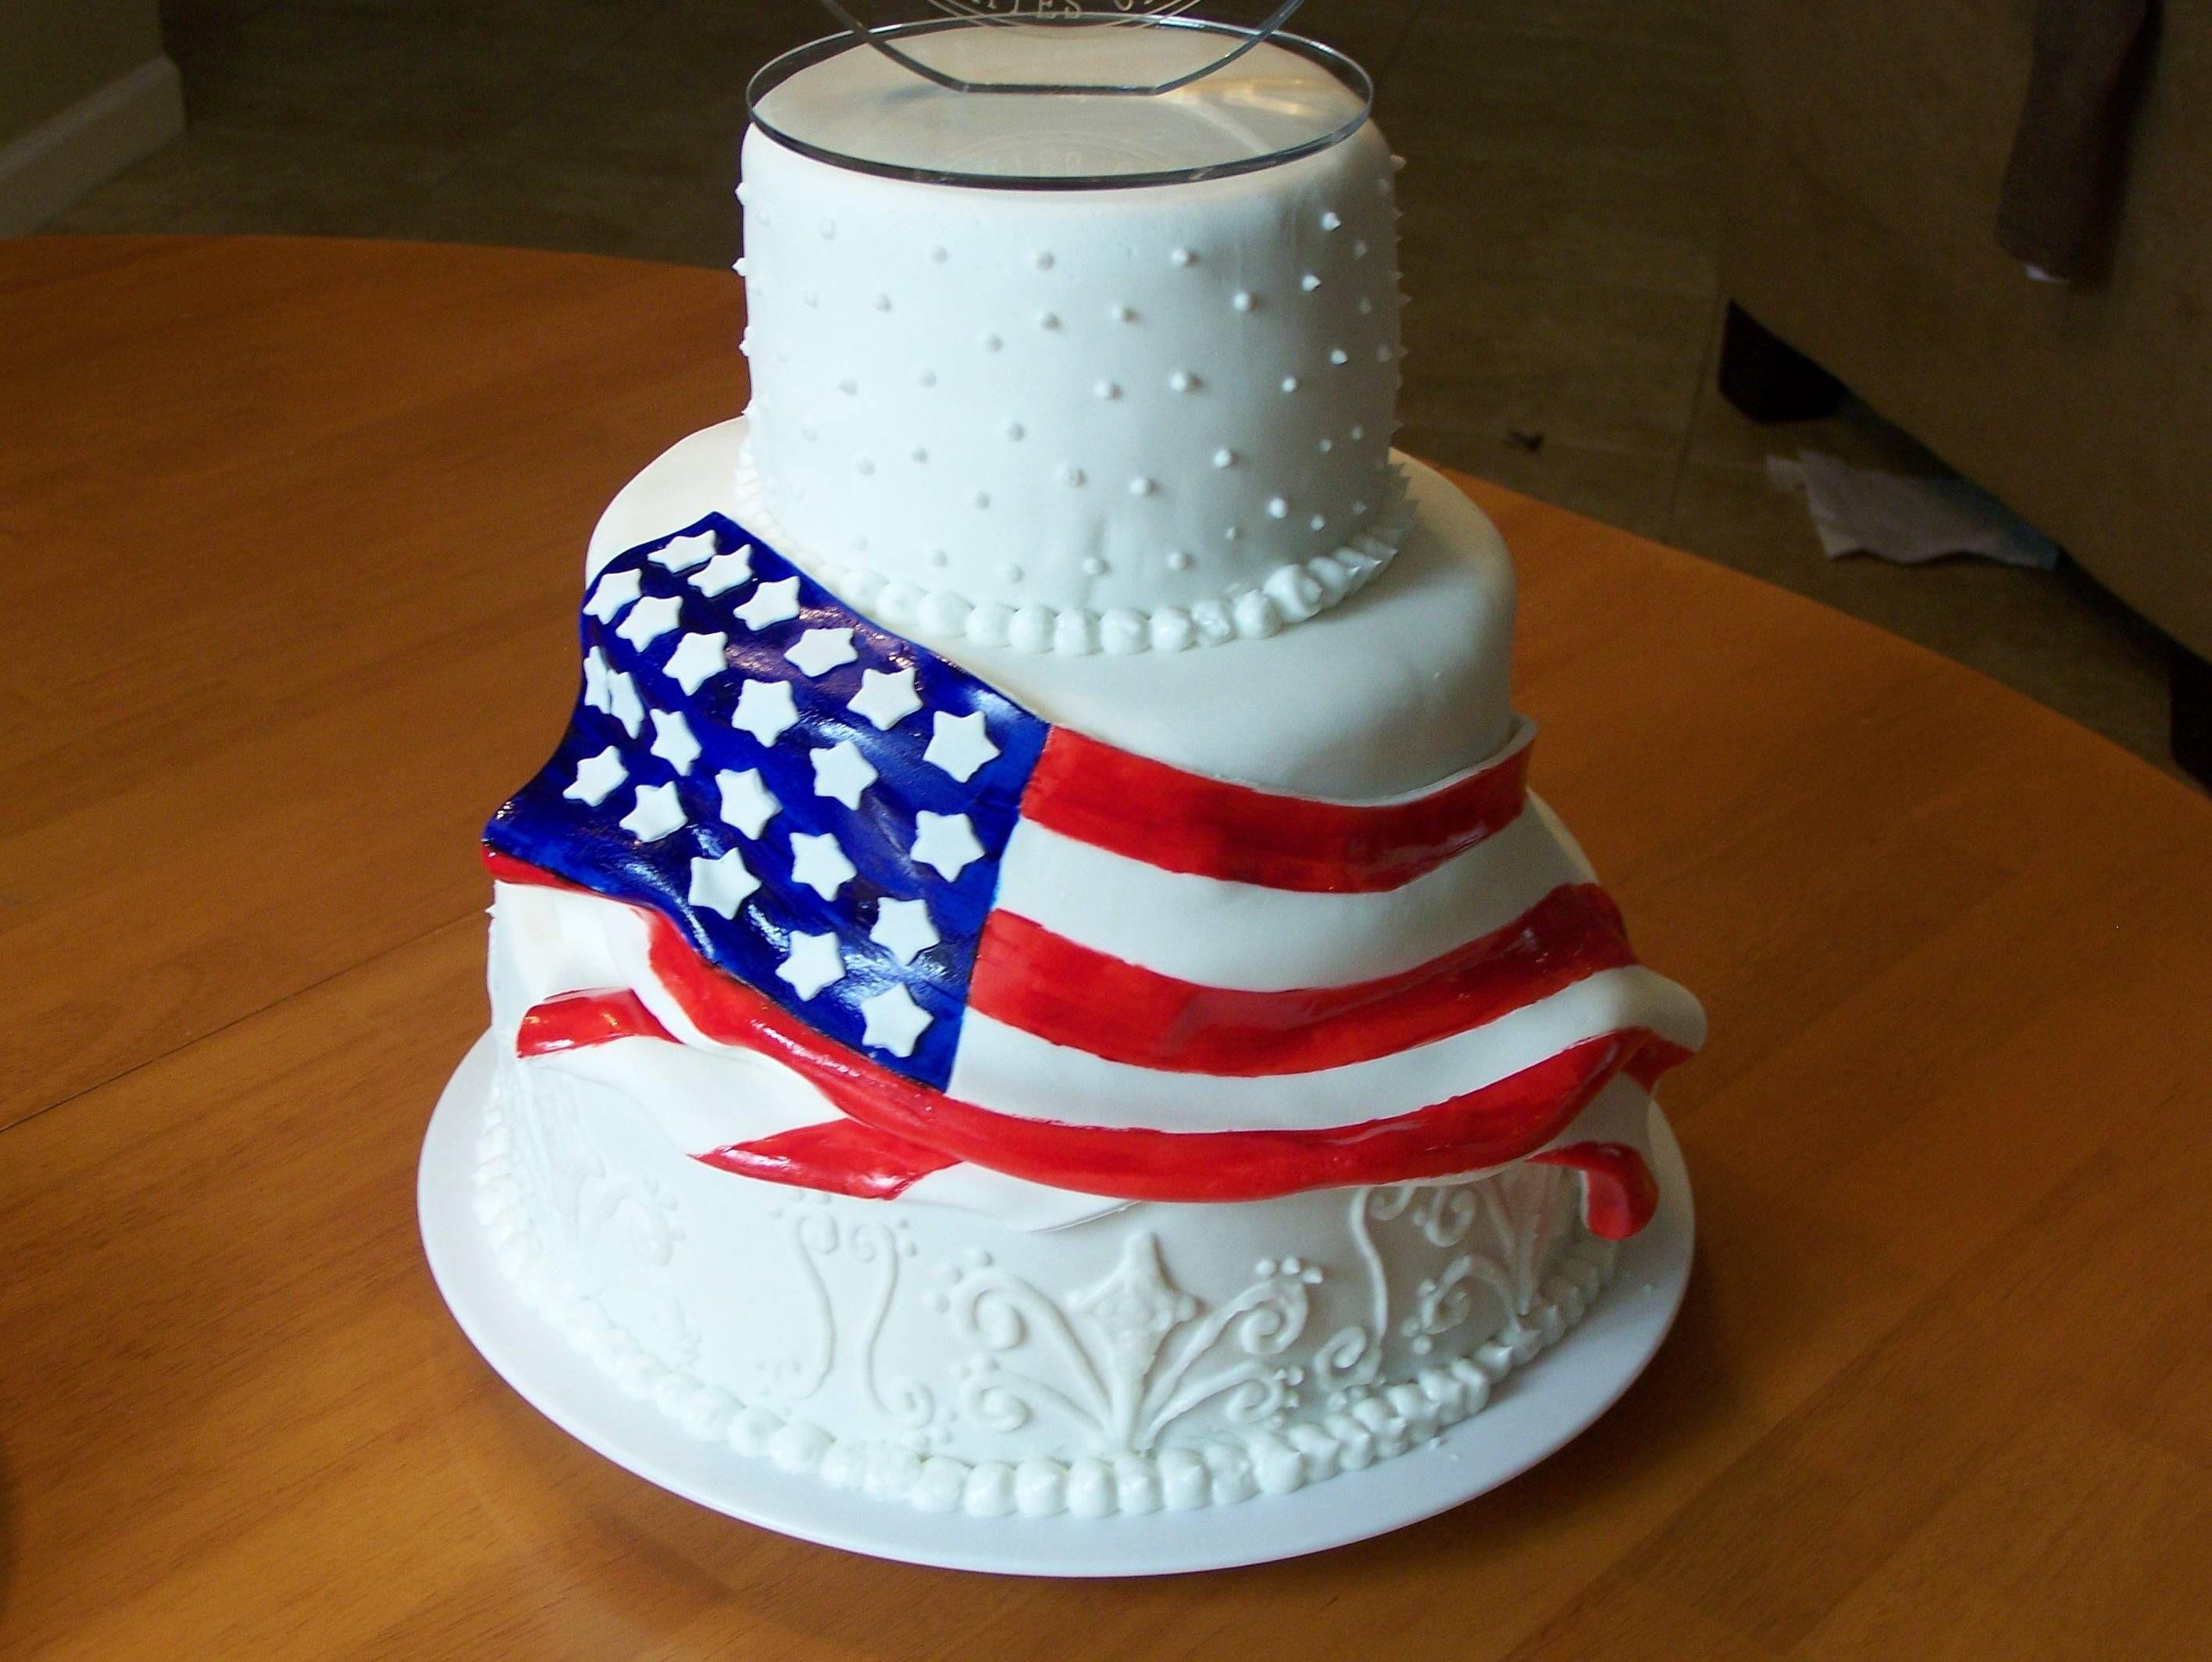 38951 Cakes Us Army Wedding Cake Jpg 2832 2128 Army Wedding